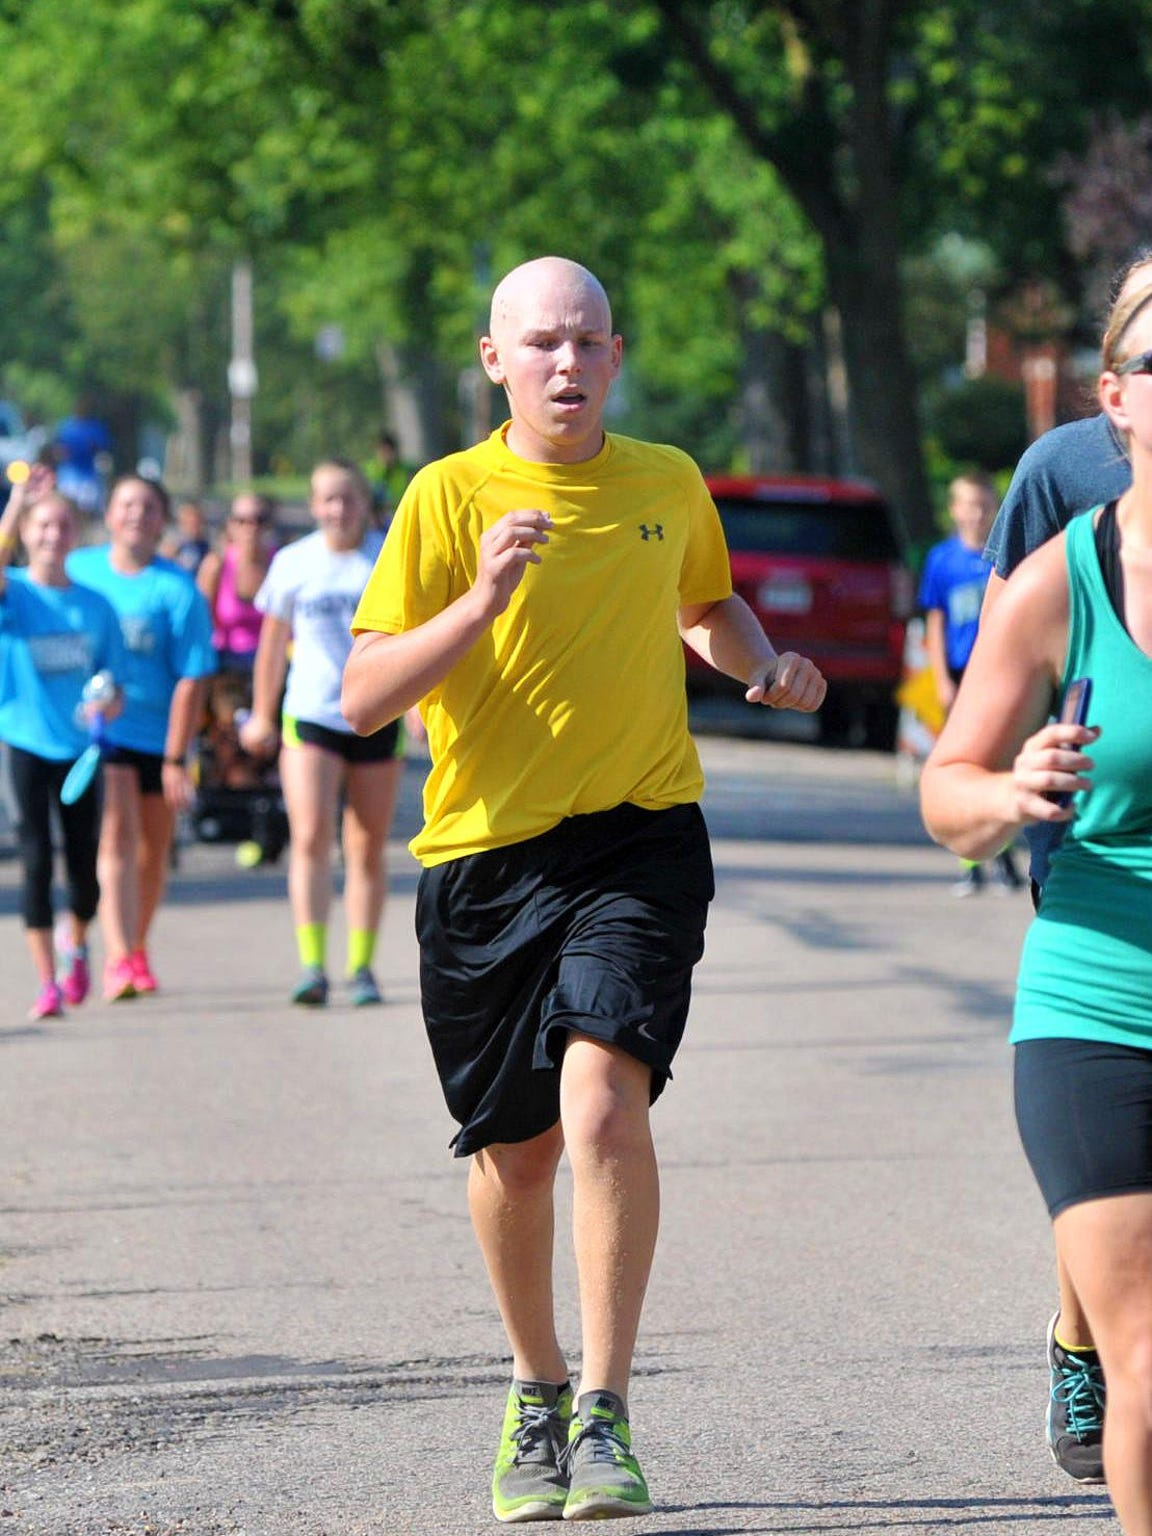 Ryan Dieringer, of Marshfield, runs Saturday during the Nutz Deep run fundraising event in Marshfield this summer.